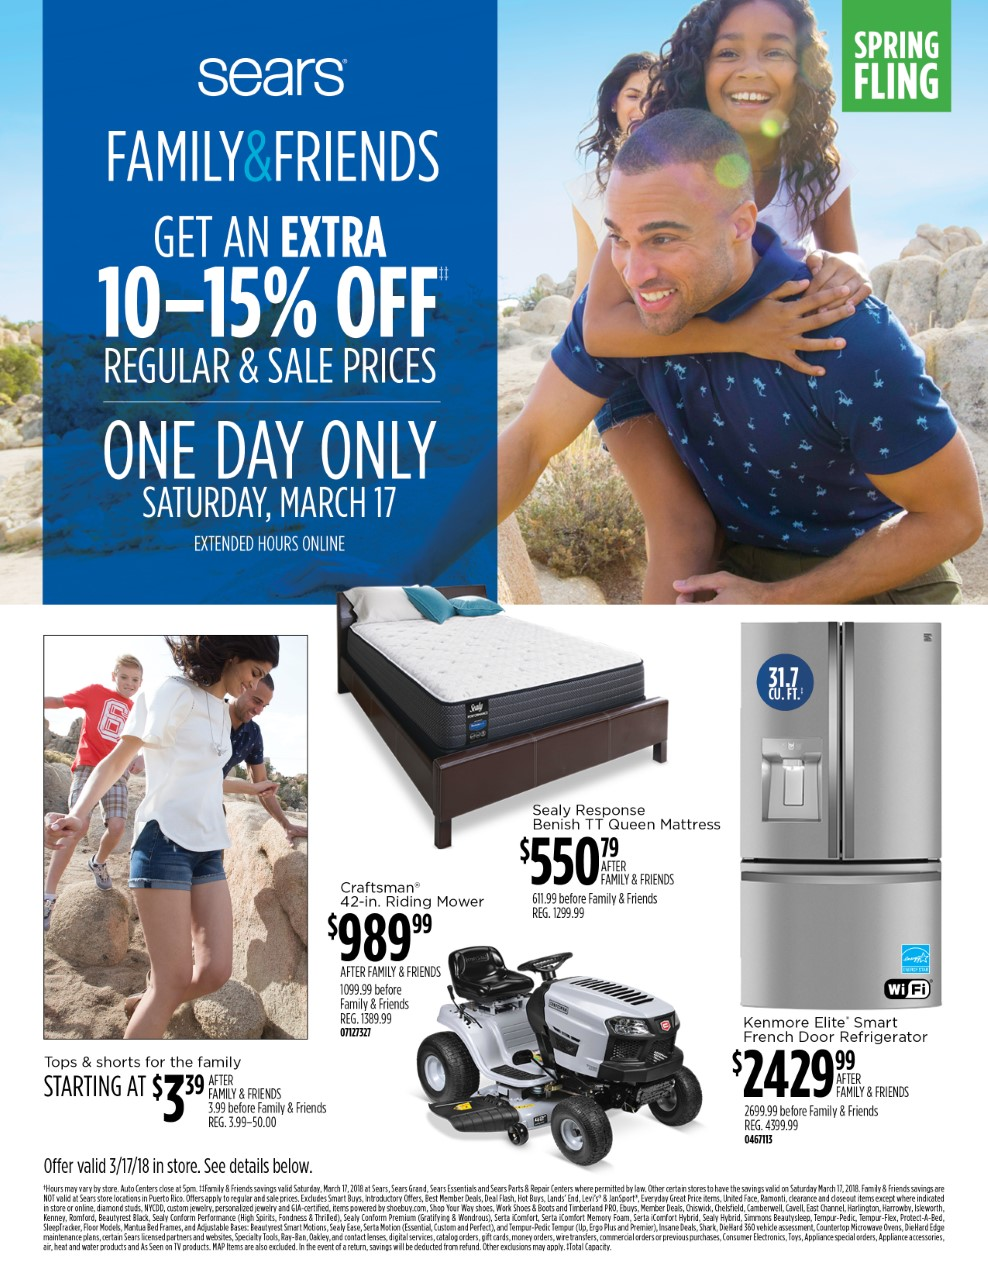 Sears Friends & Family Savings